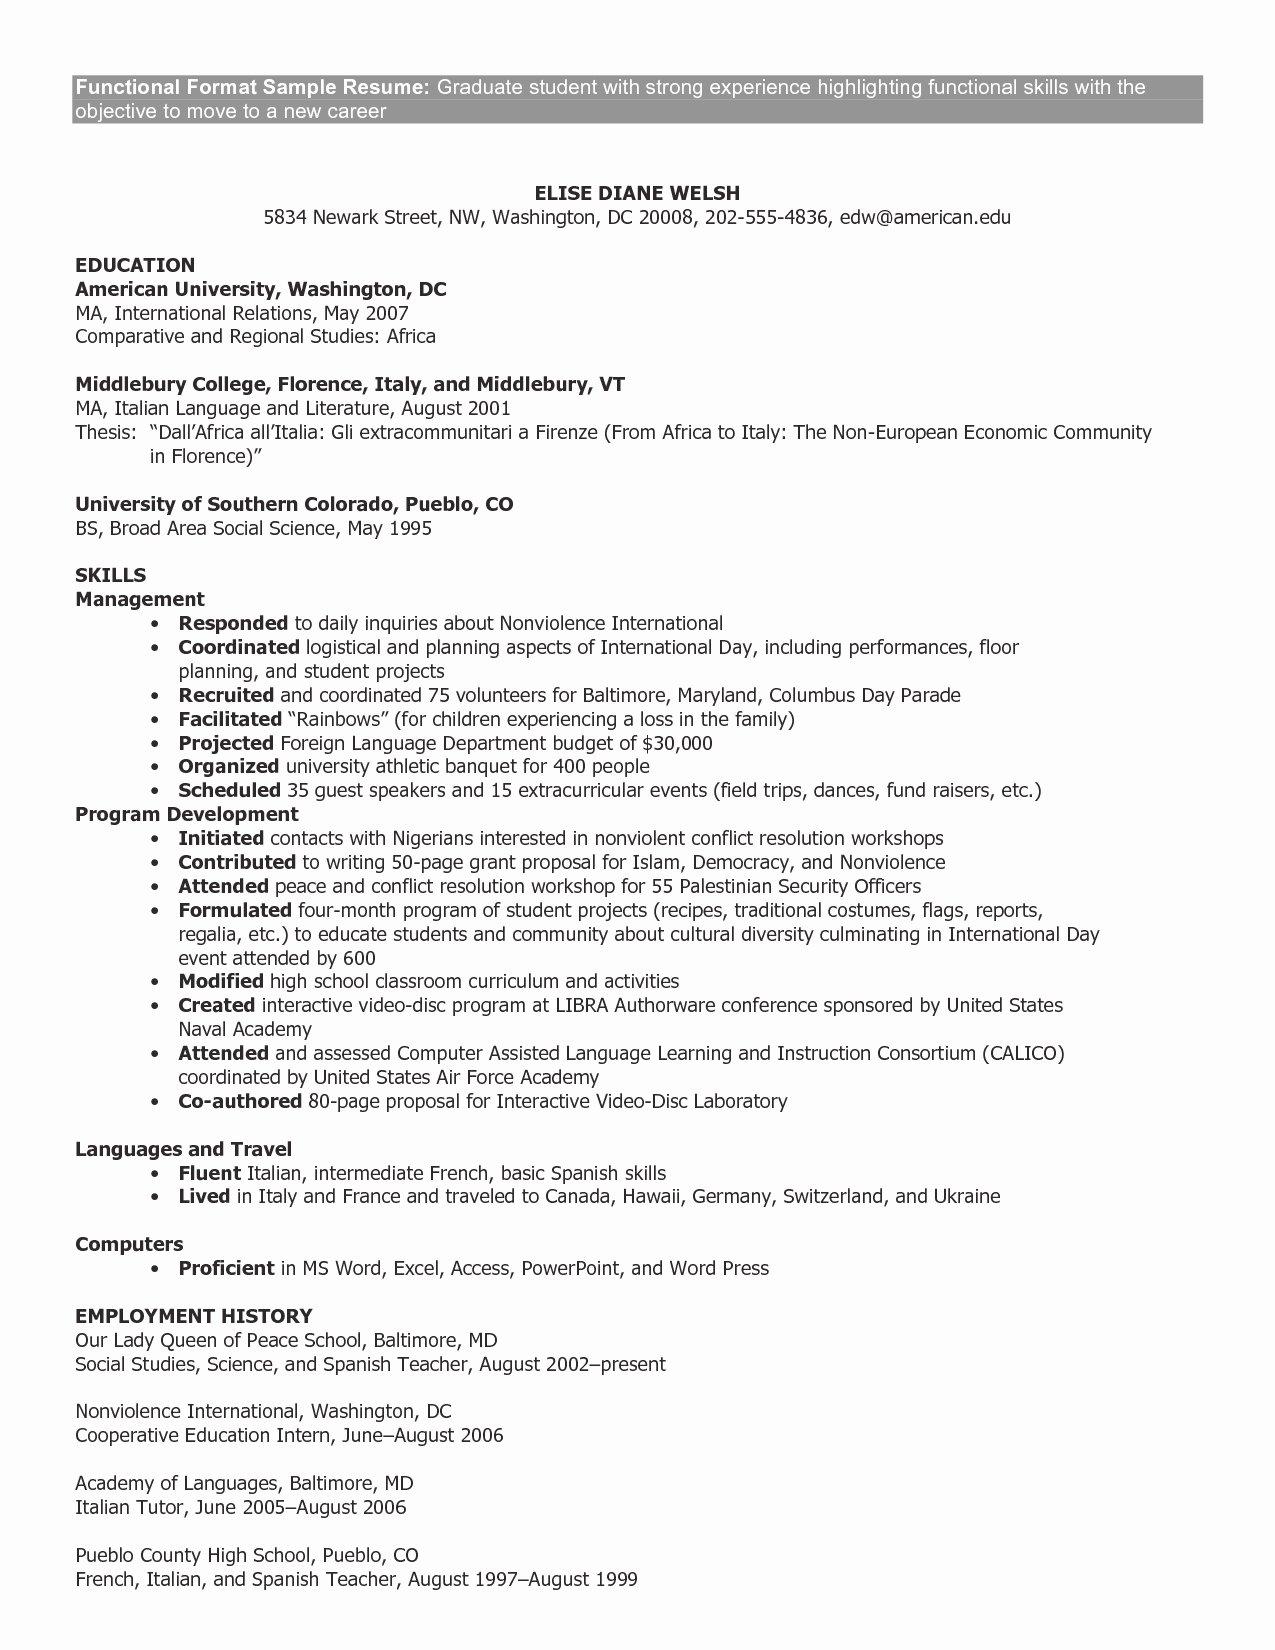 Cu Boulder Letter Of Recommendation Lovely American University Essay Sample Bamboodownunder